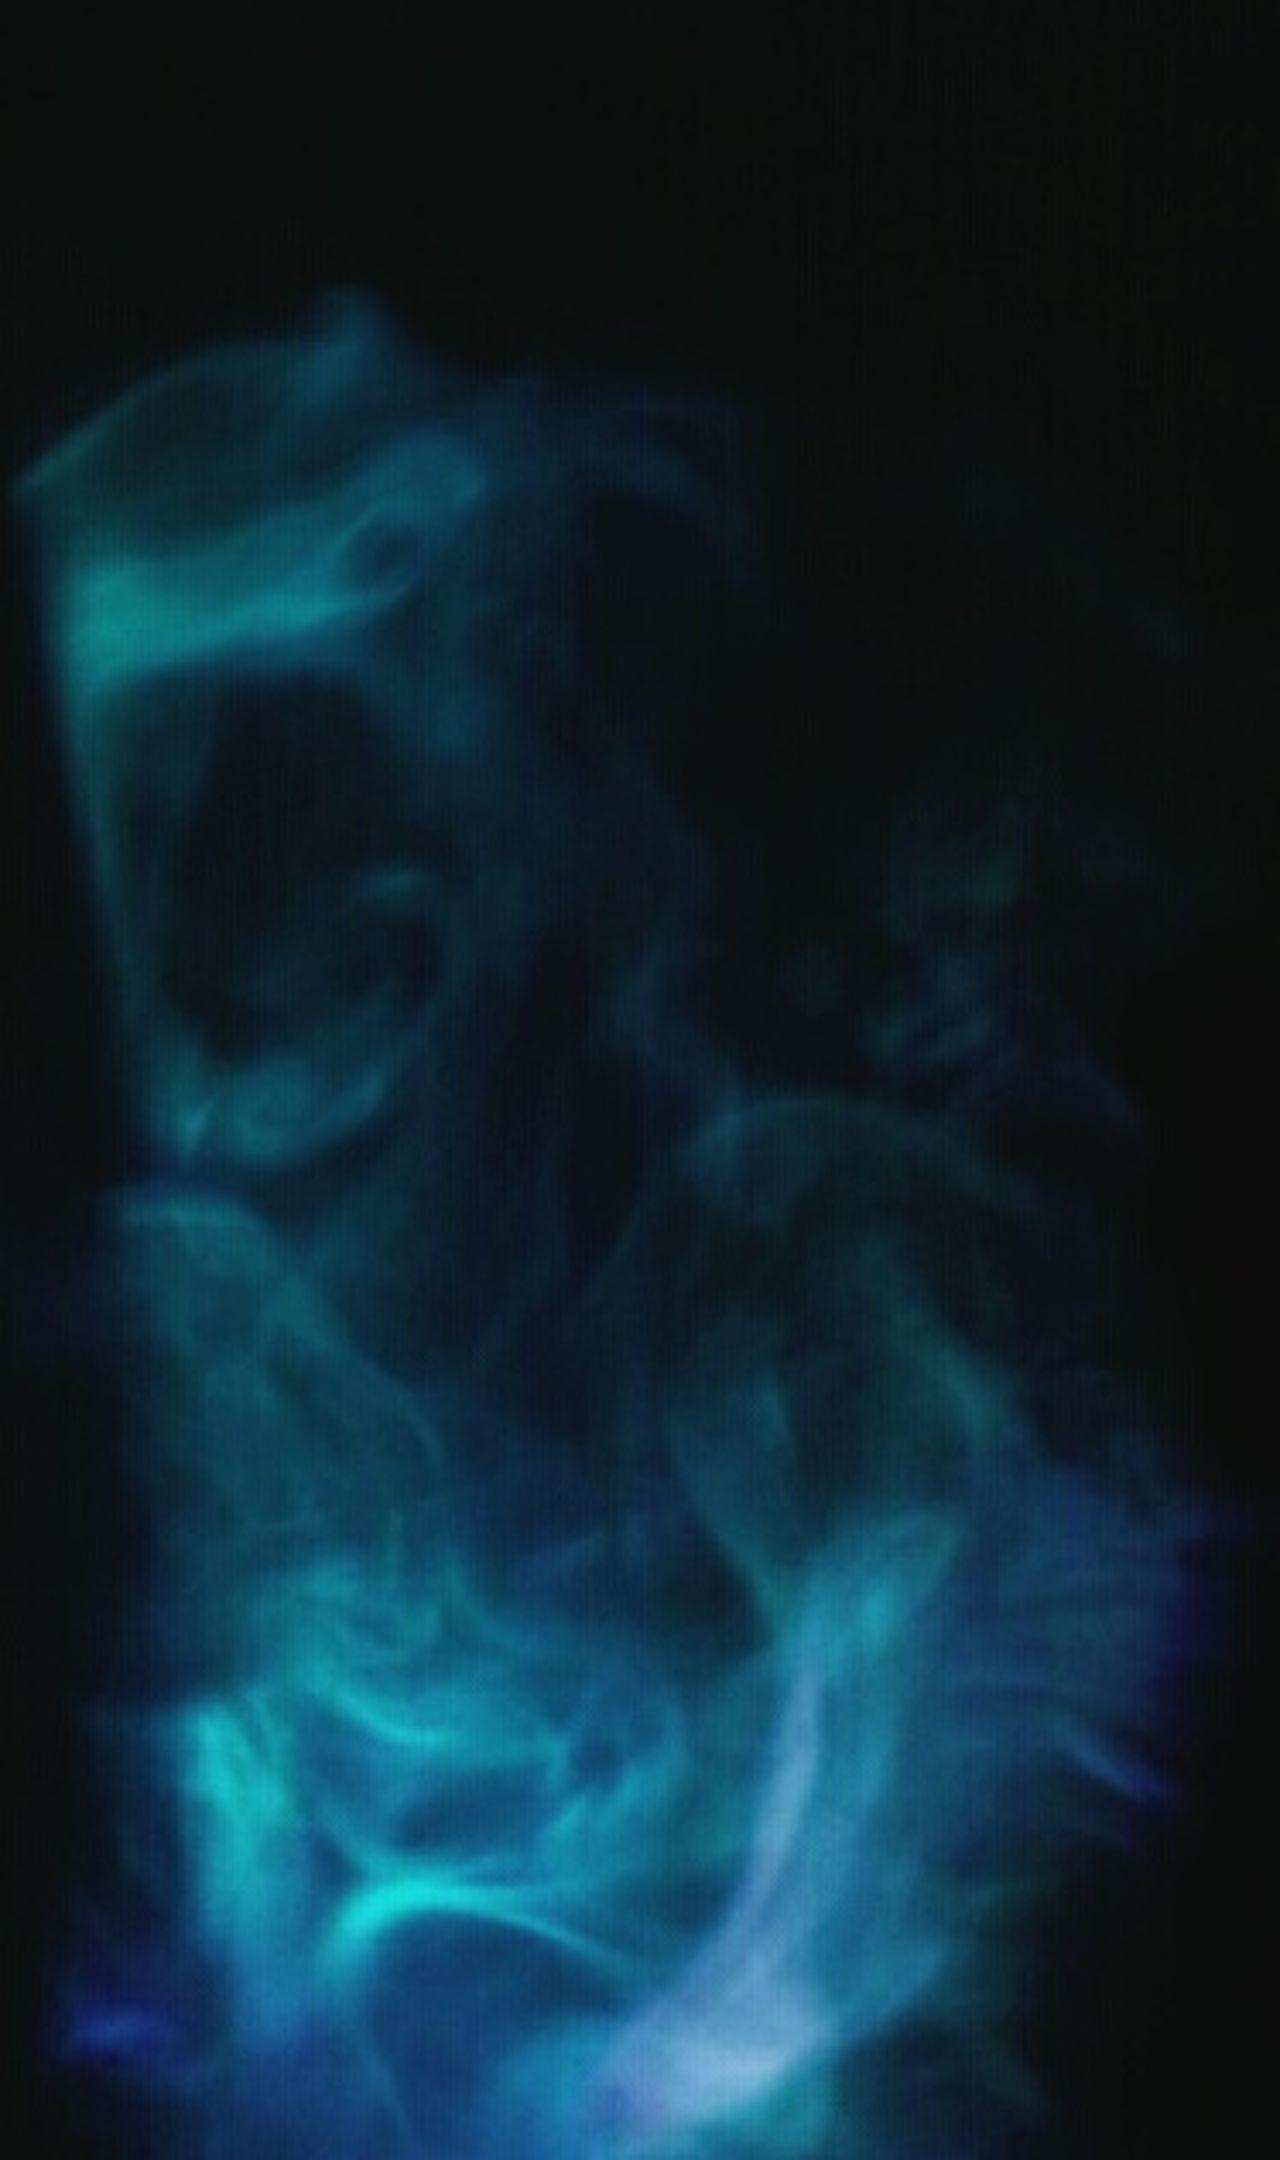 Smoketricks Smoke Smoked Smoker Oddities Smoke♥ Strange Clouds Demons All Around Us Dark Photography Illuminated Smoke Tricks Motion Monsters The Magic Mission Electric Light Glowing Blurred Motion Black Background Demons Inside